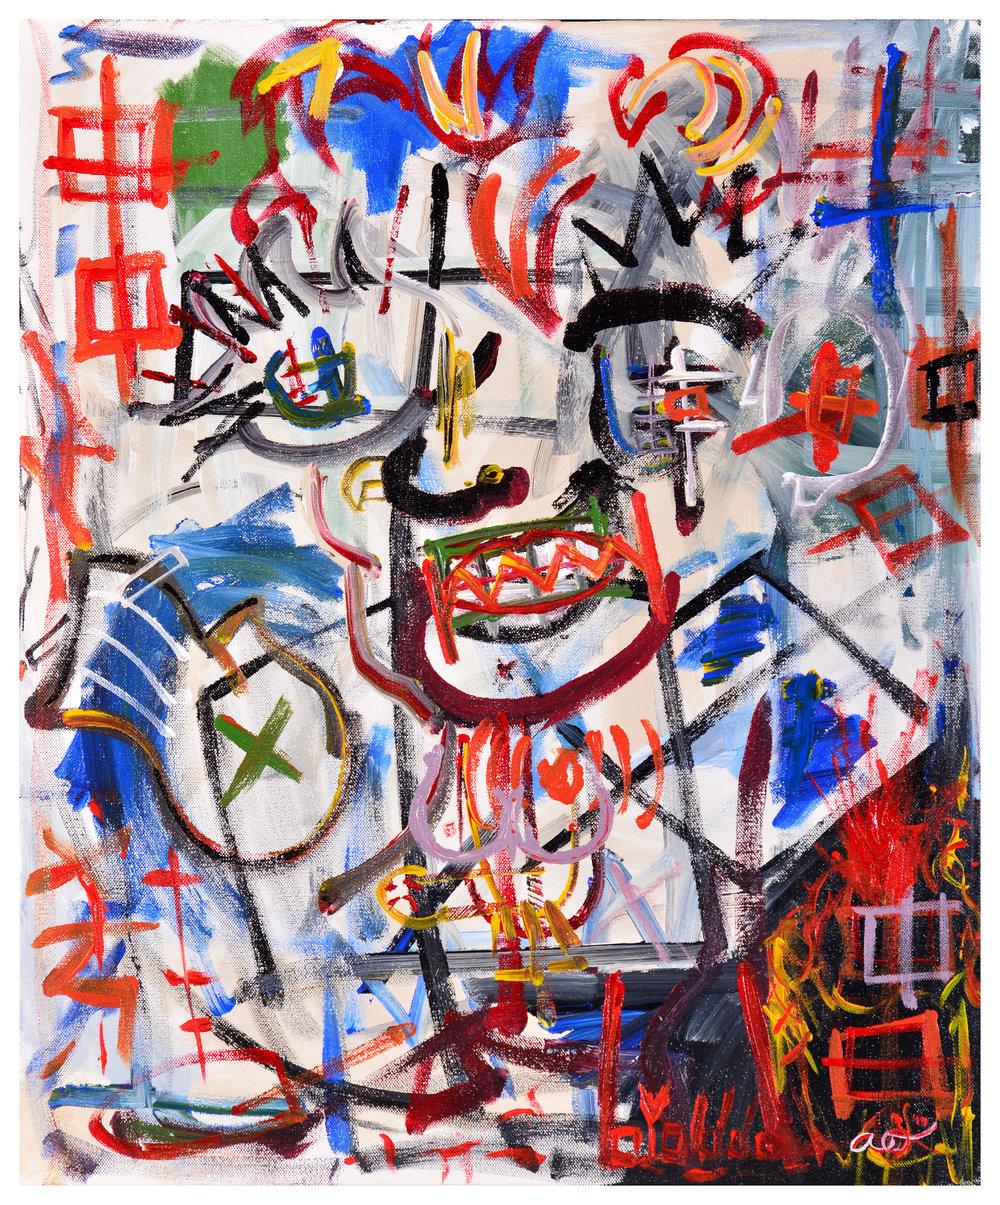 Untitled XIV (SHRK)